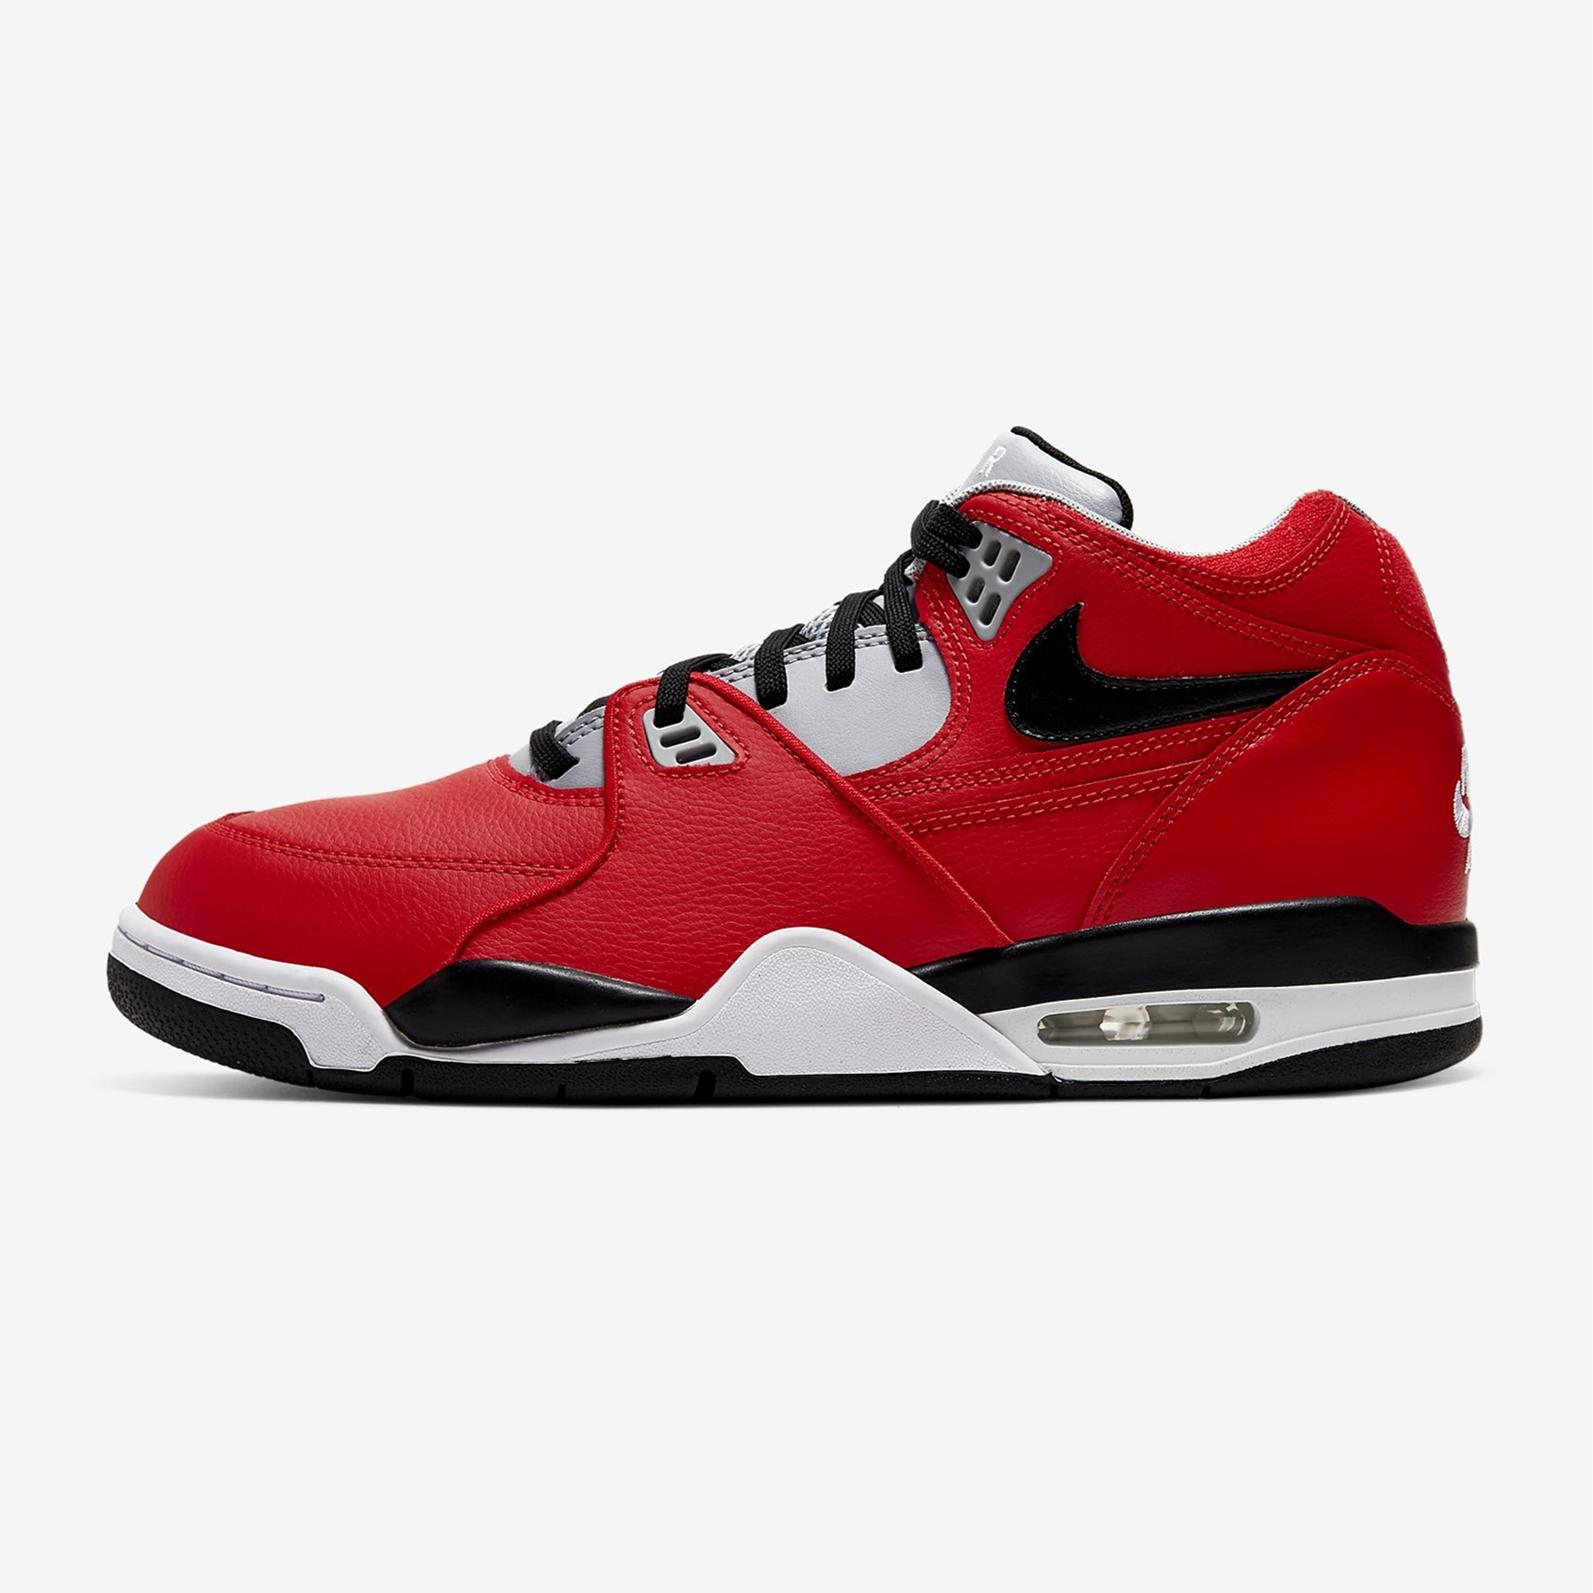 Nike 耐克 Air Flight 89 男子运动鞋